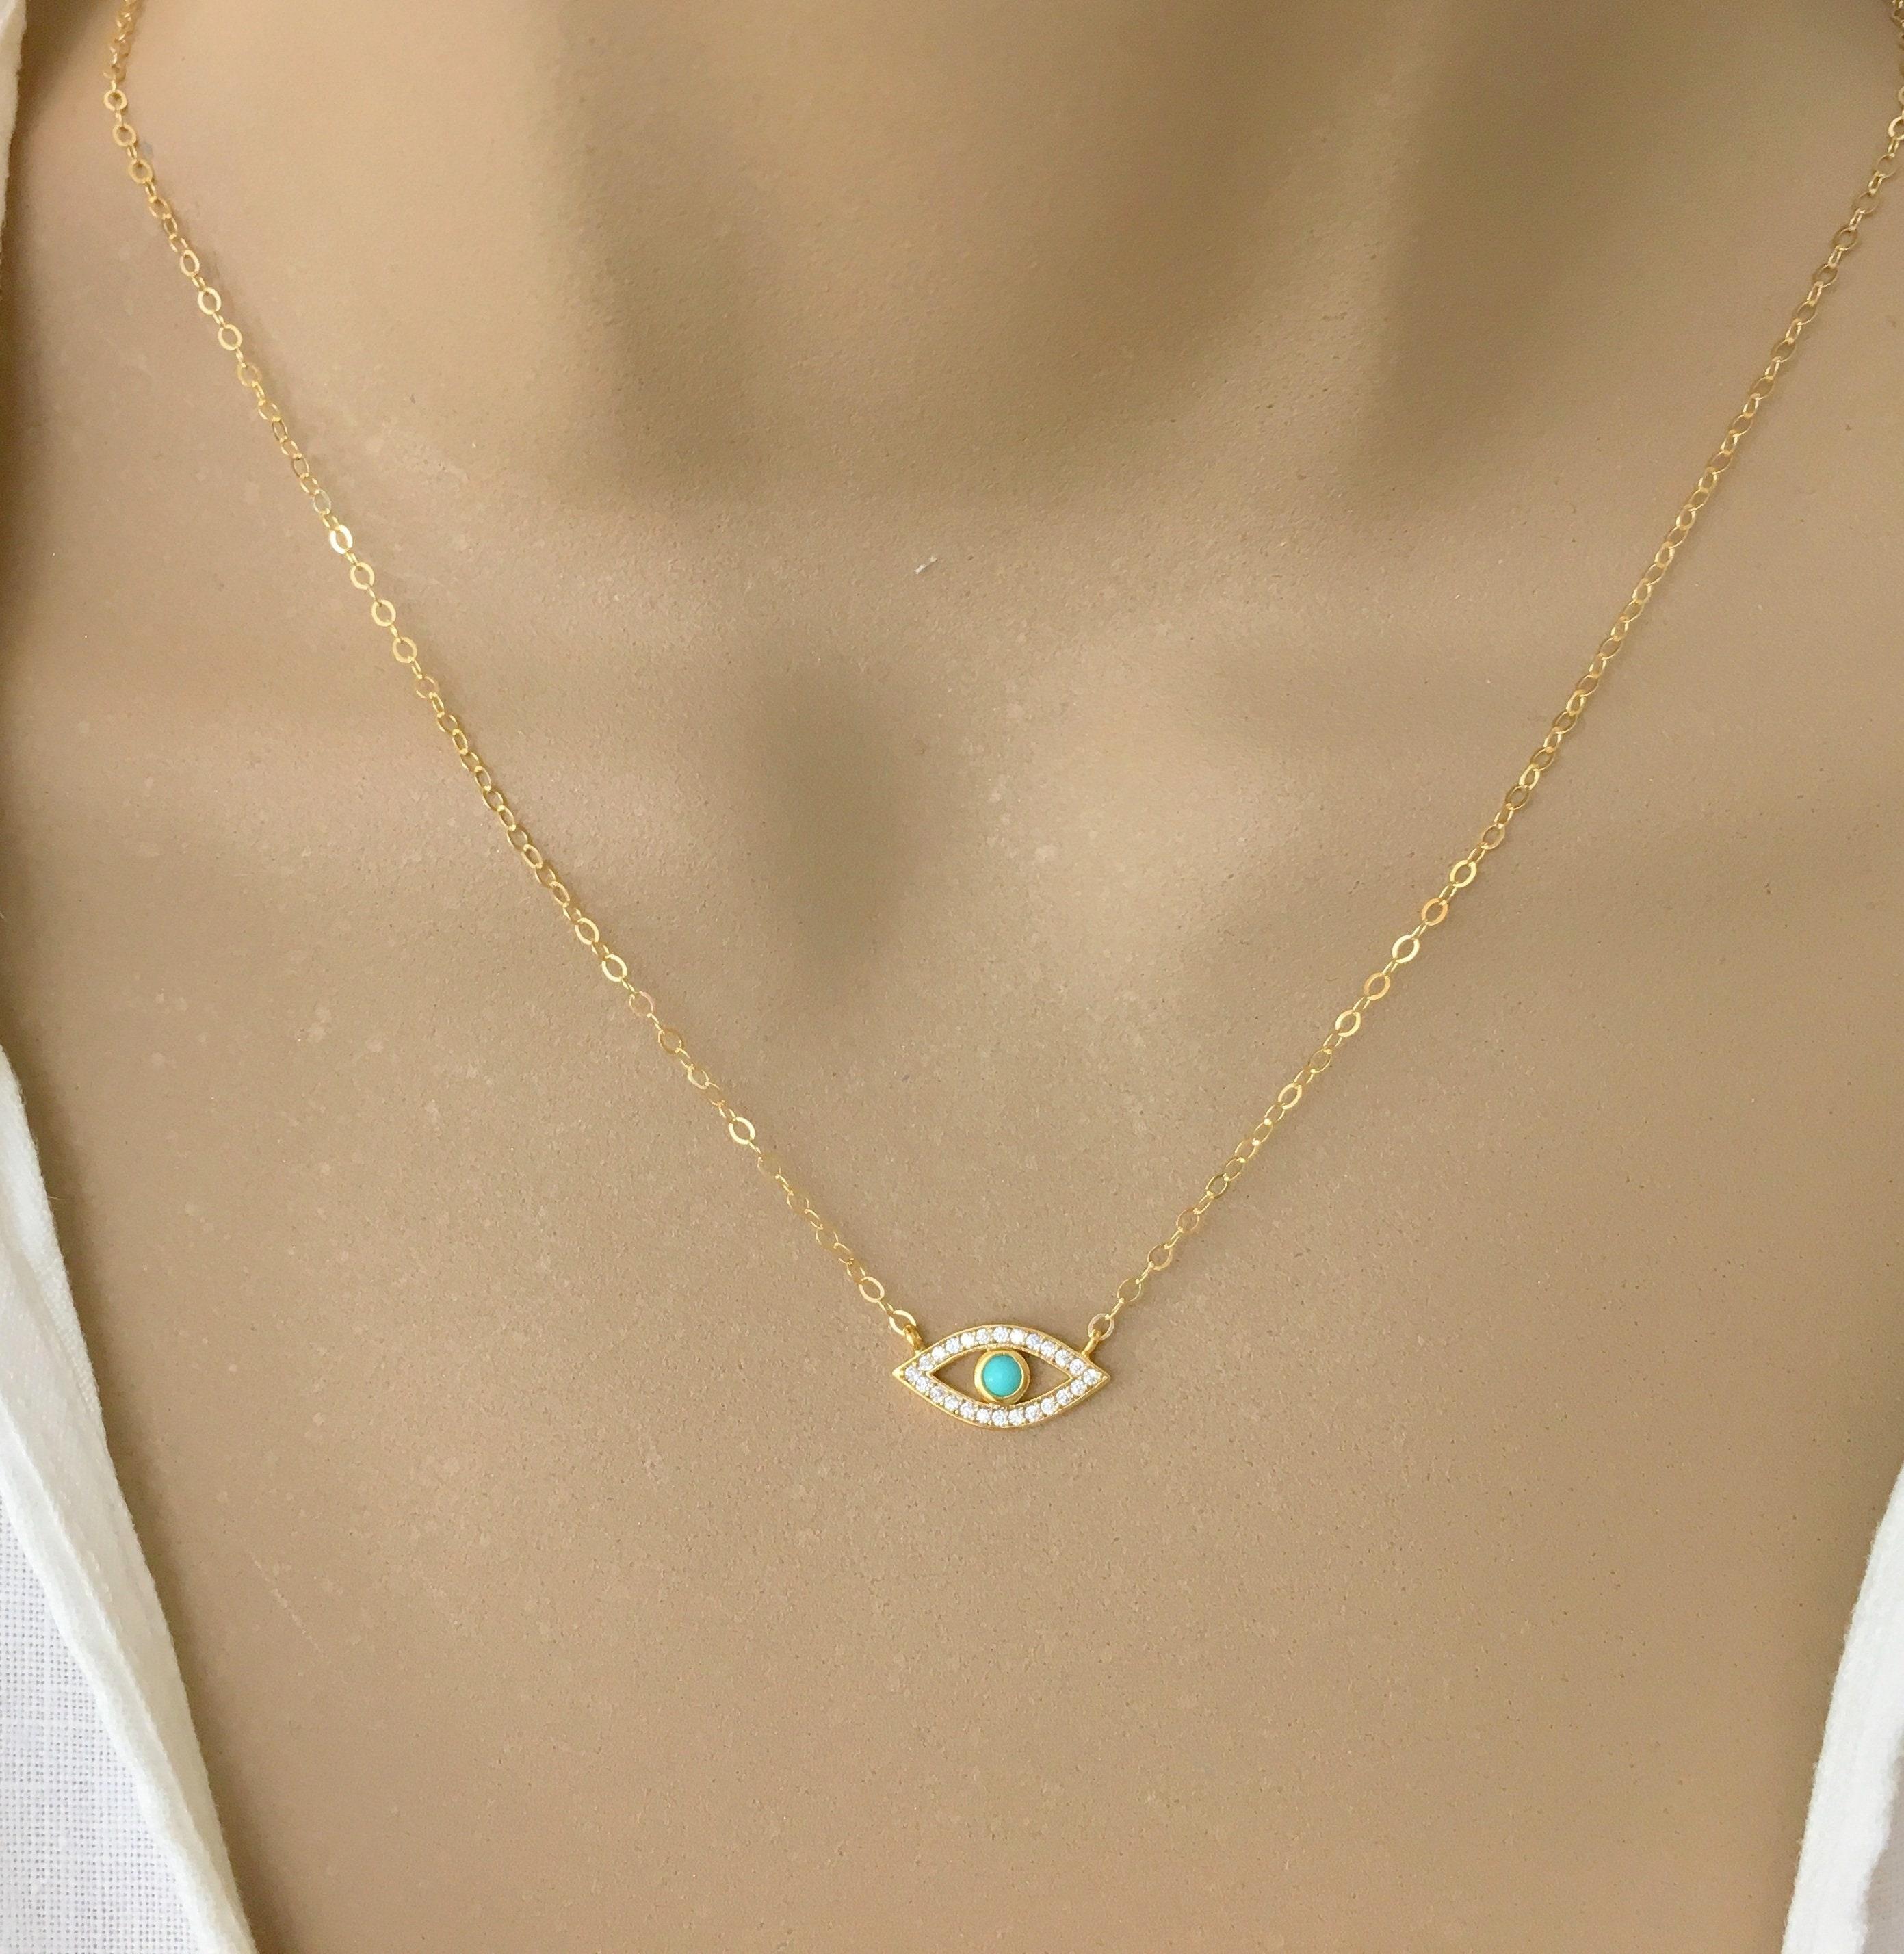 Greece. Micro Pave Pendant Minimalist Evil Eye Necklace Dainty Necklace Personalize Jewelry 925 Silver Blue /& White Enamel Pendant